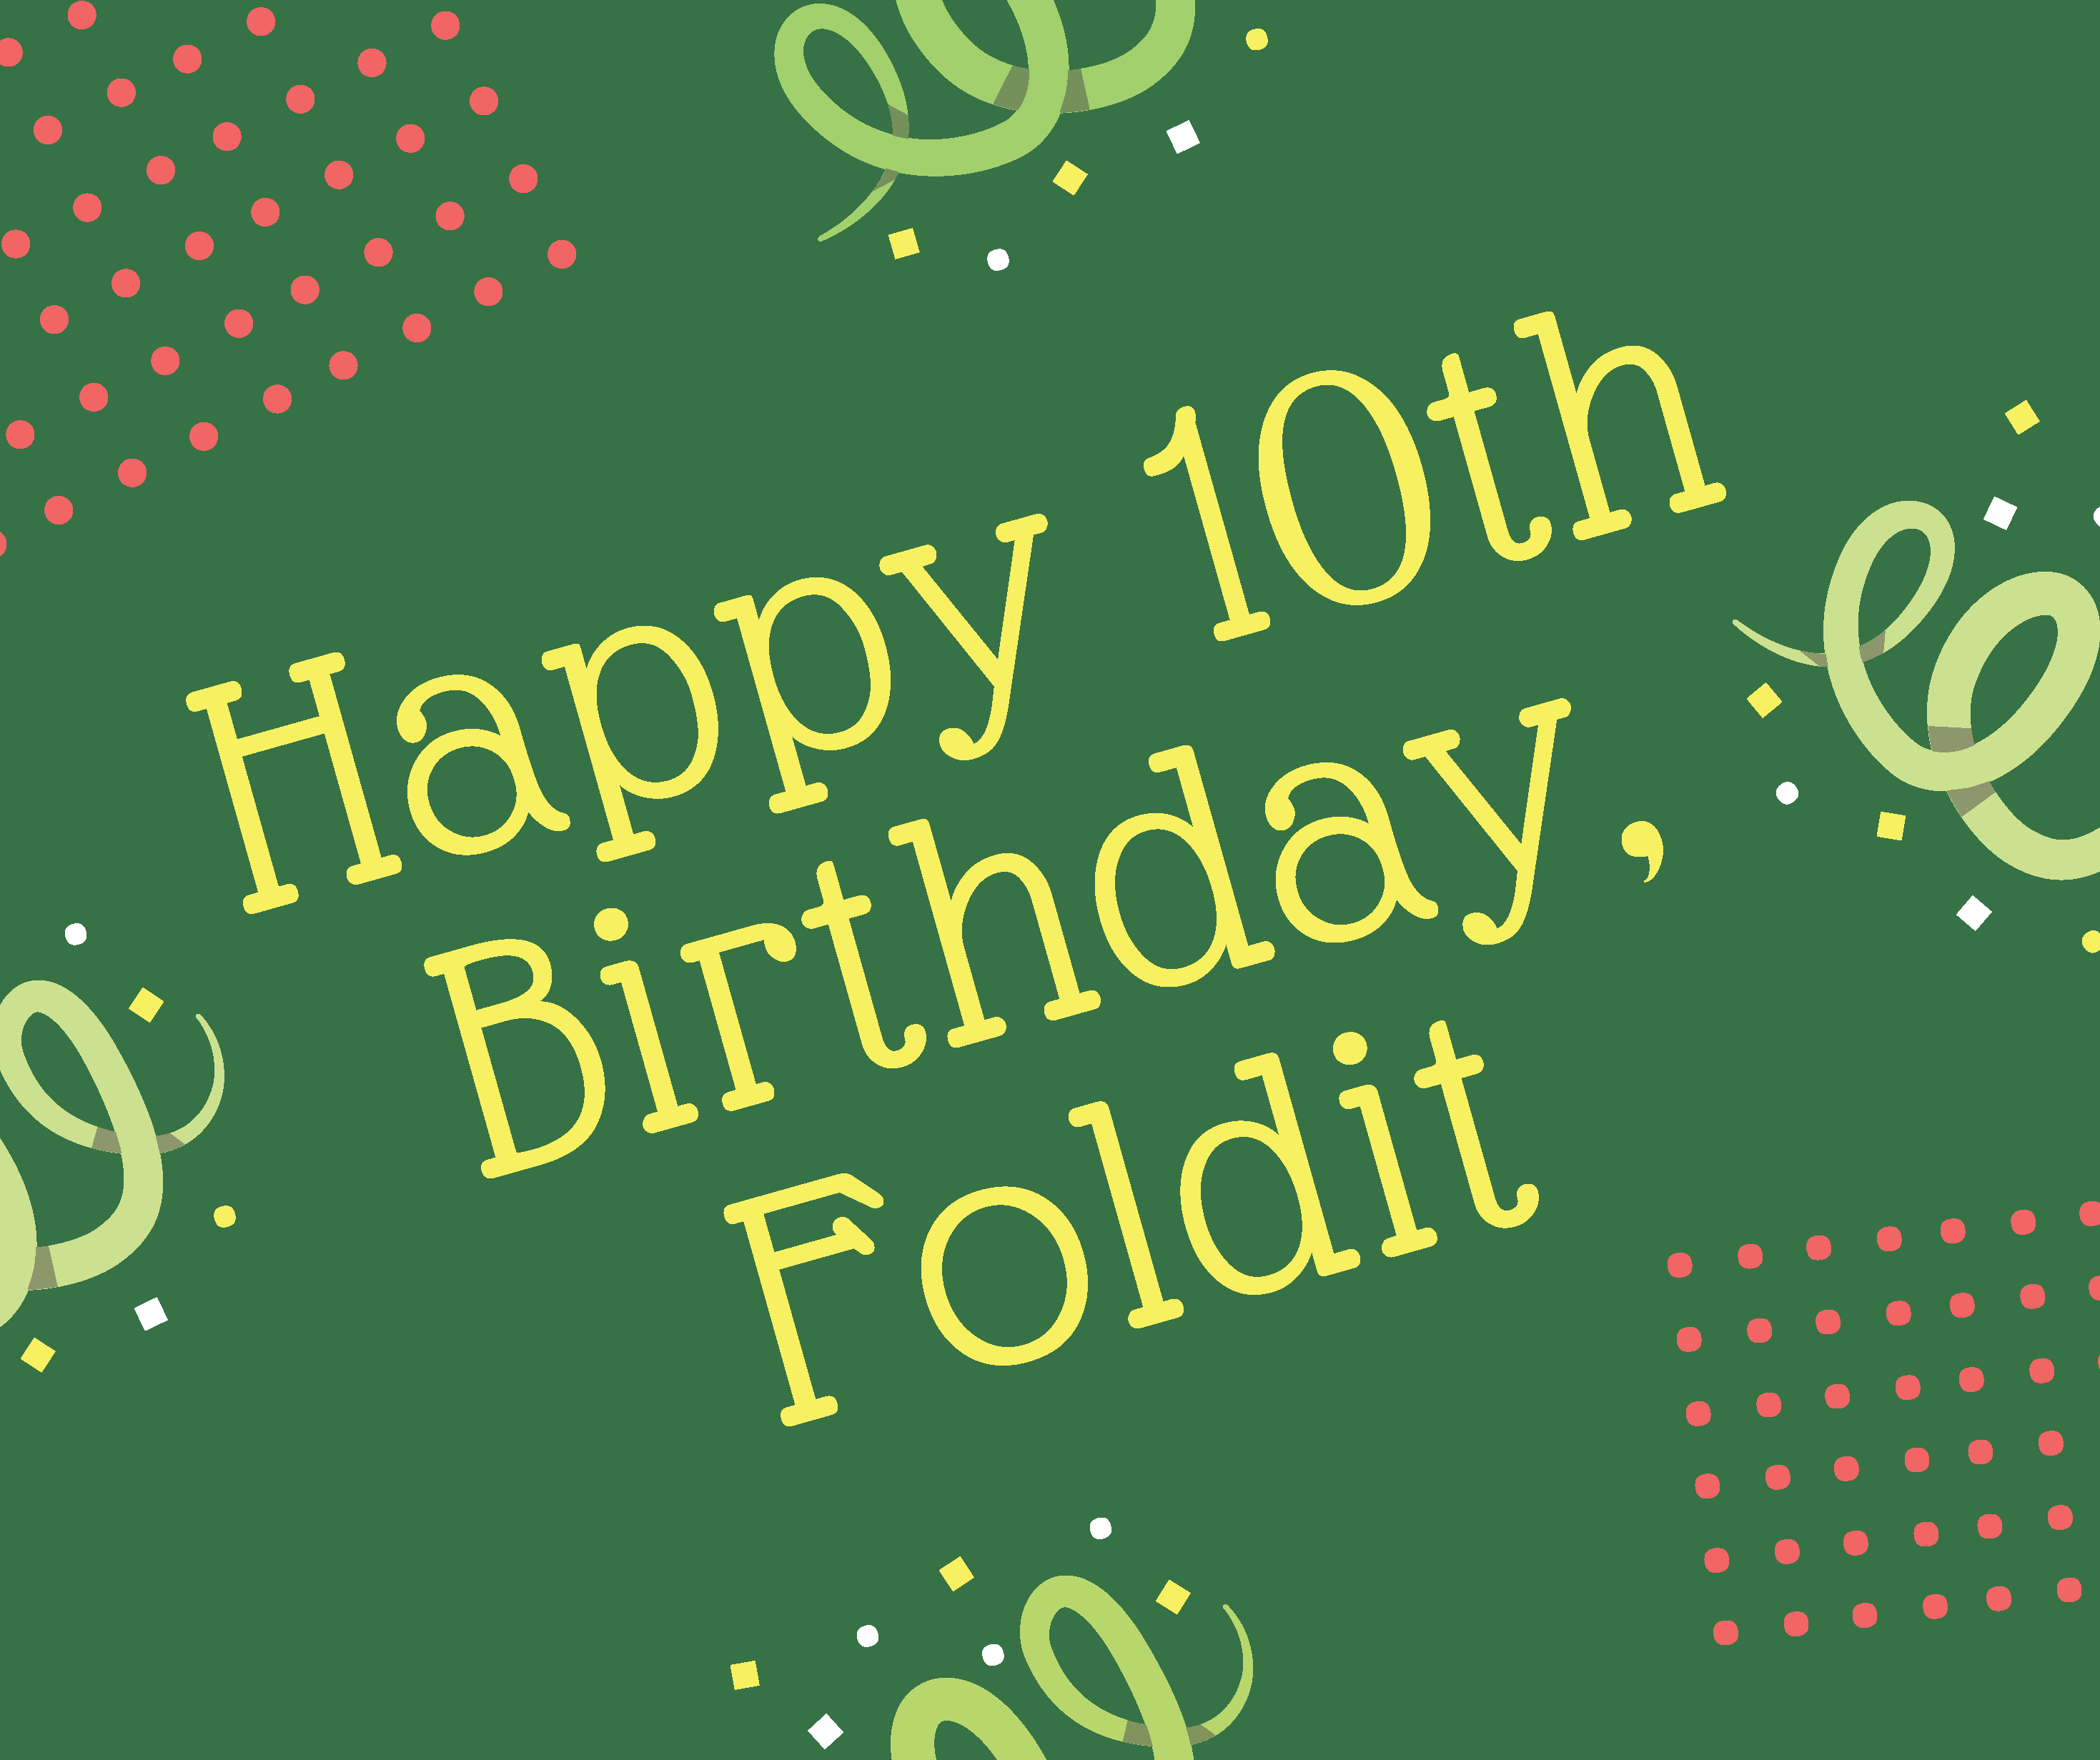 Happy 10th Birthday Foldit image